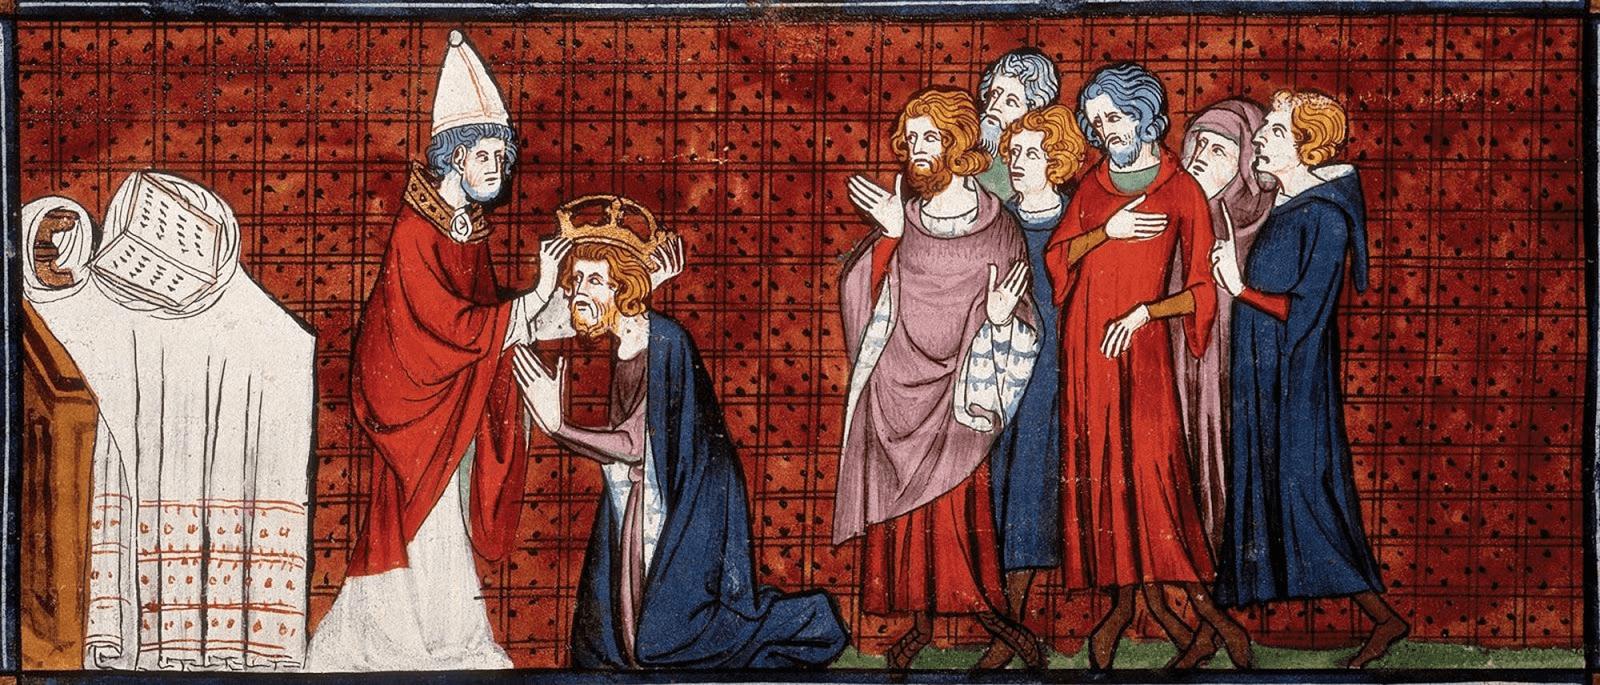 Mito ou verdade? O que foi a Idade Média